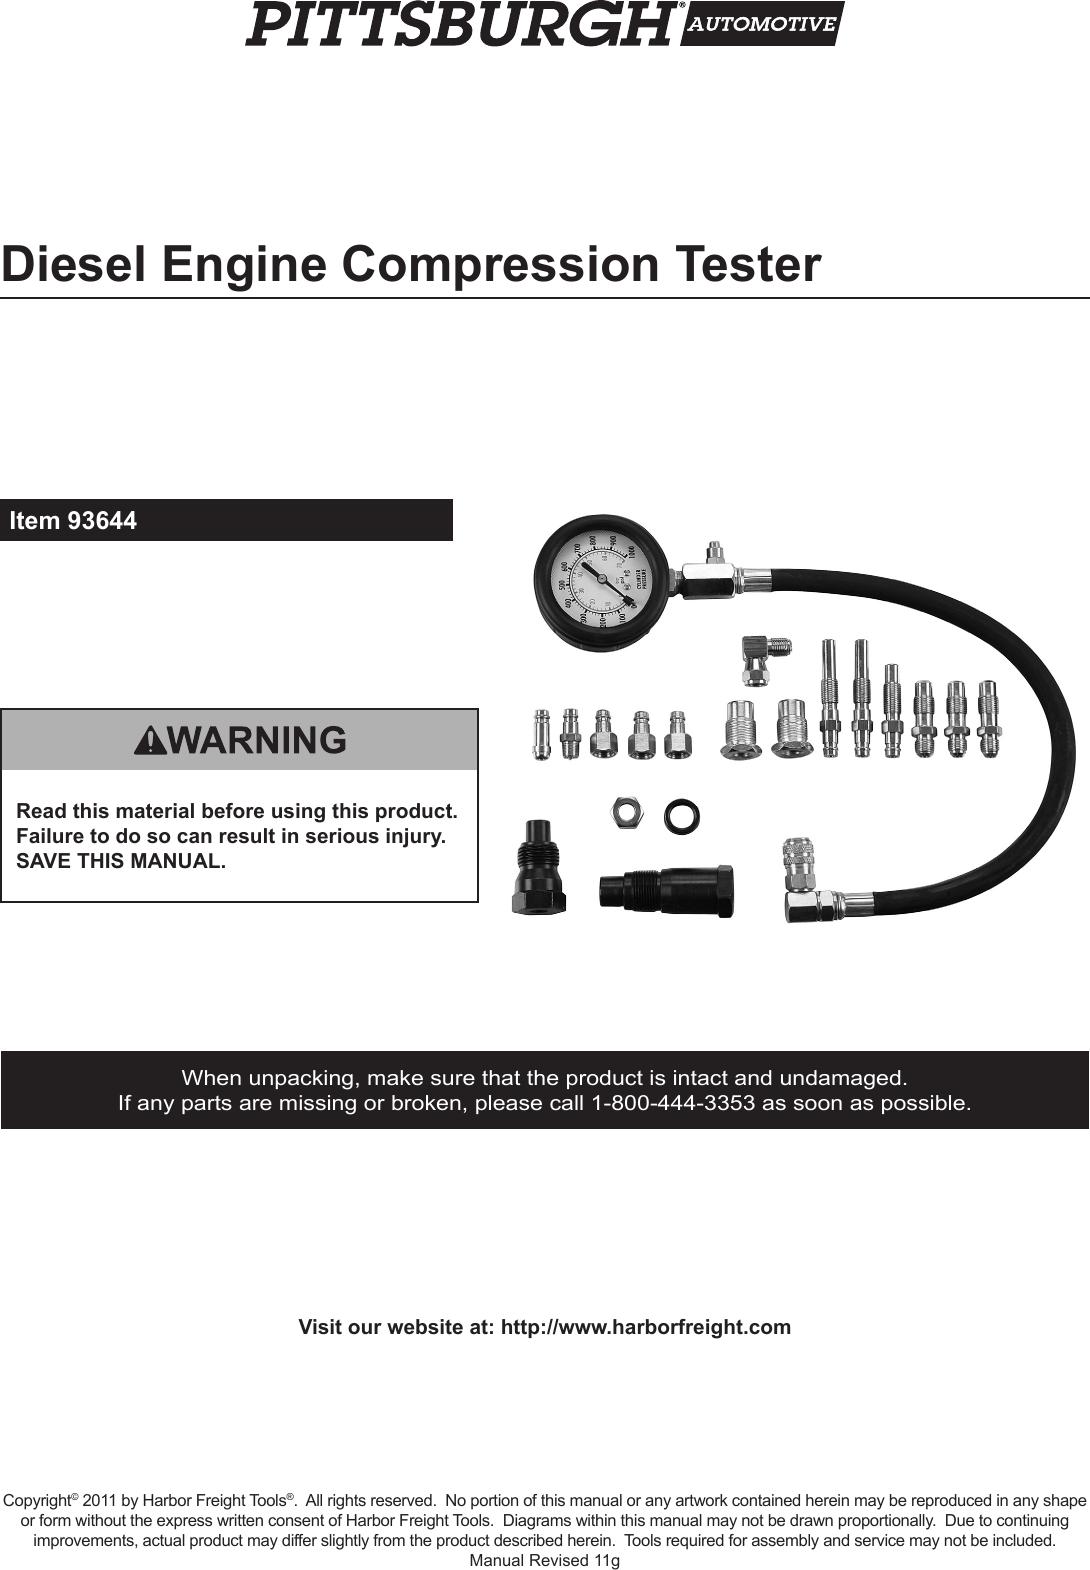 Harbor Freight Diesel Engine Compression Er 20 Pc Product Manual Isuzu 6hk1 Diagram